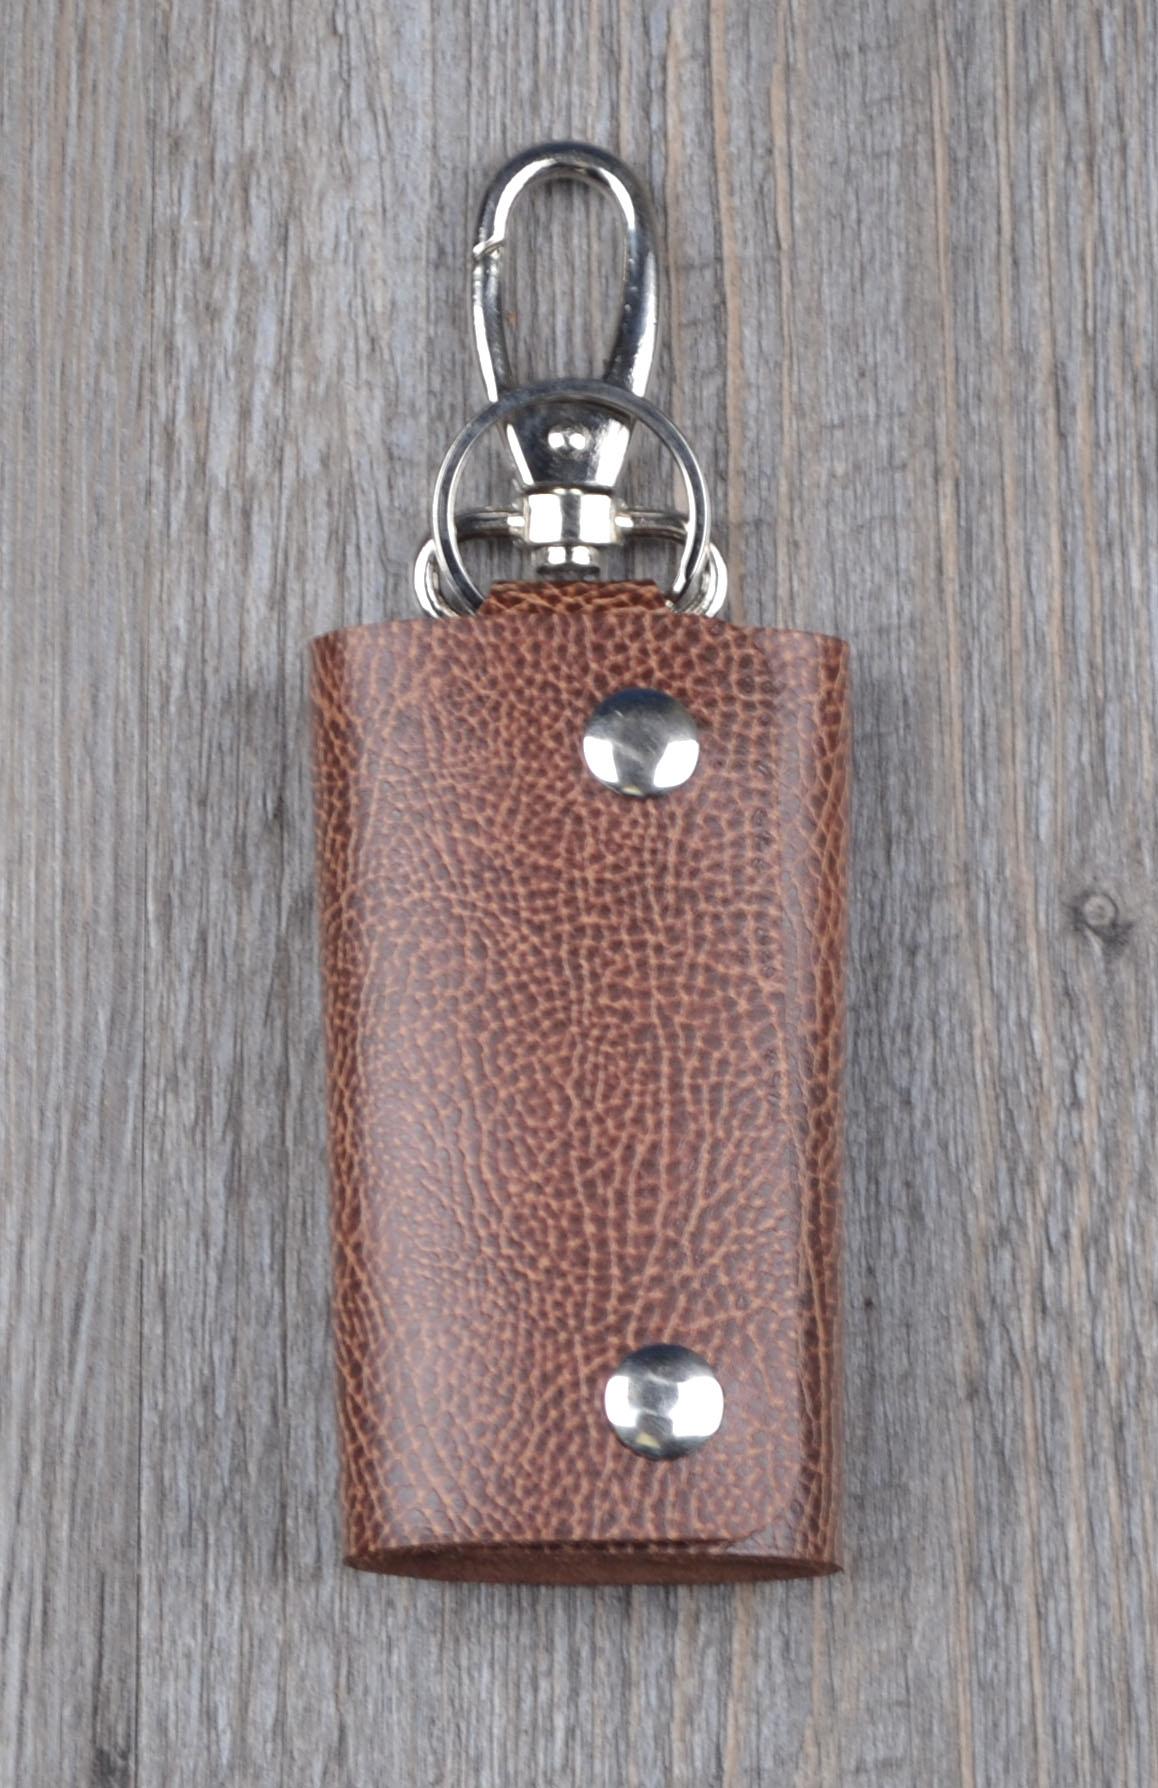 6b41c4982 London Knicker Vintage Handmade Leather Key Holder Wallet LC123 | Super  Hero Jackets, Movies Jackets, Fashion Jackets, Motorcycle Jackets